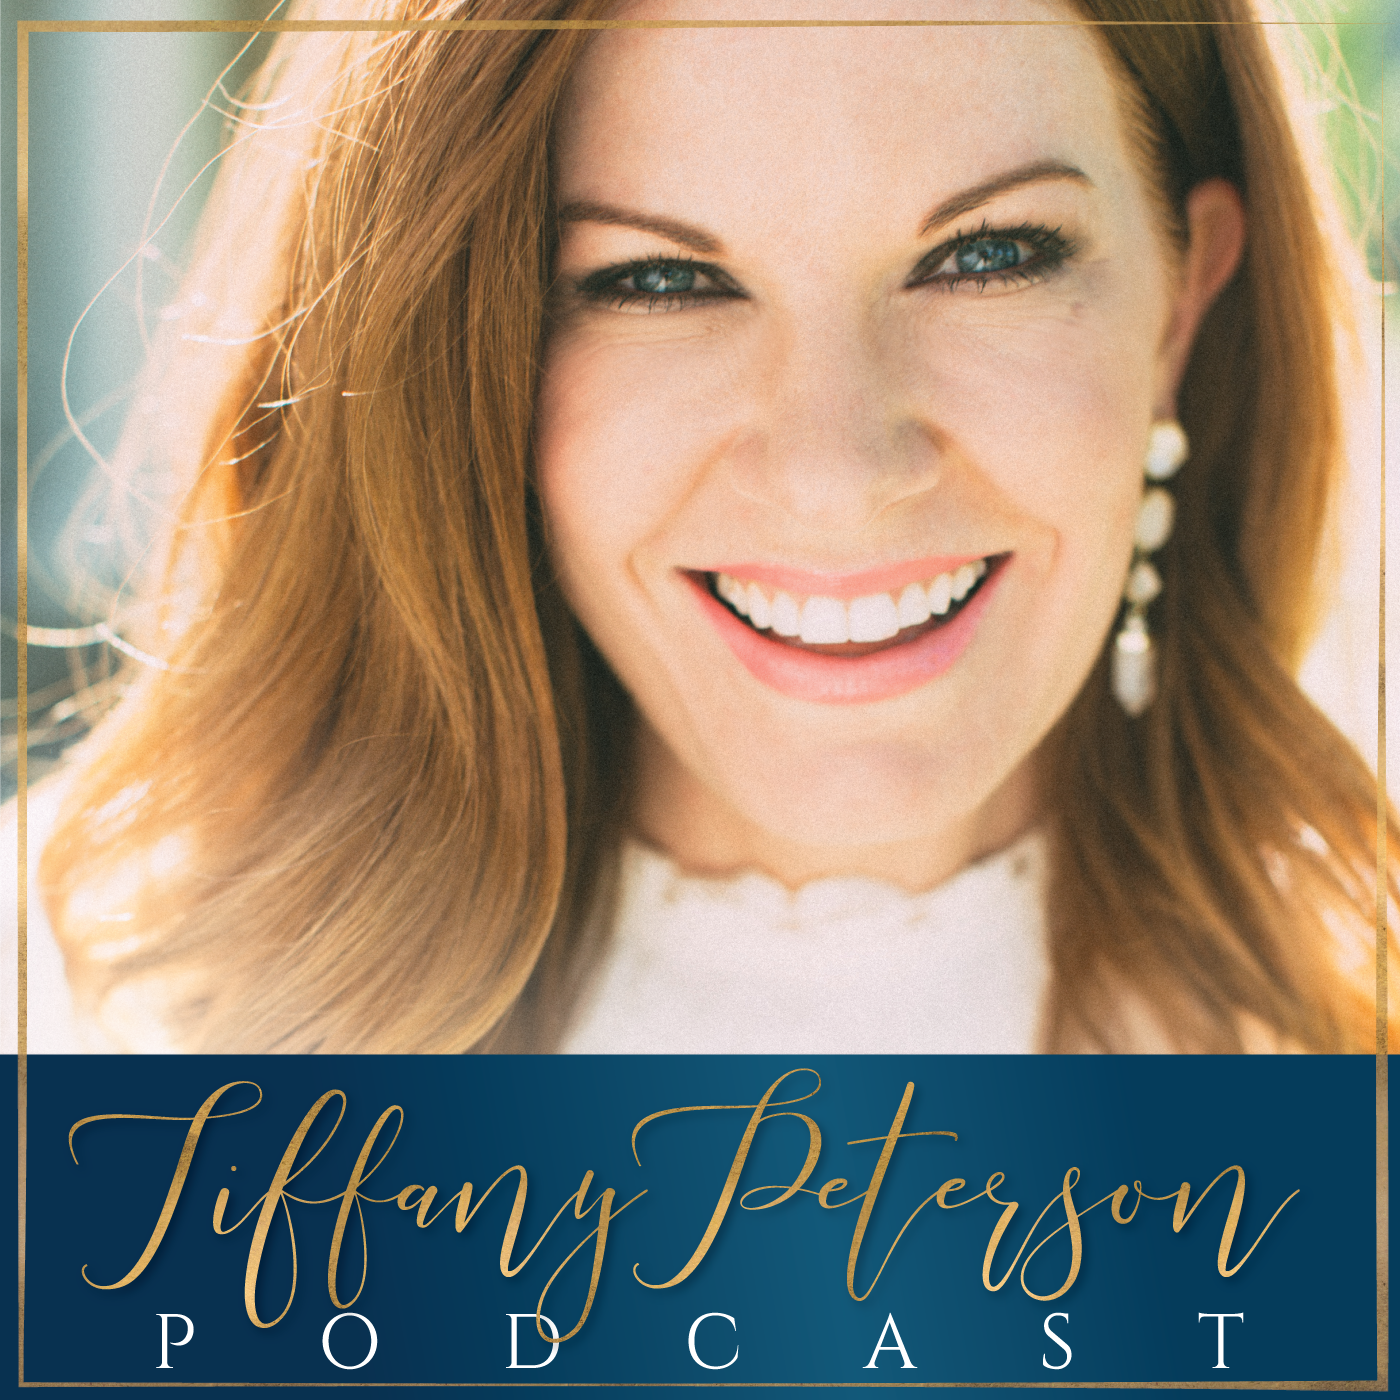 Tiffany Peterson Podcast show art